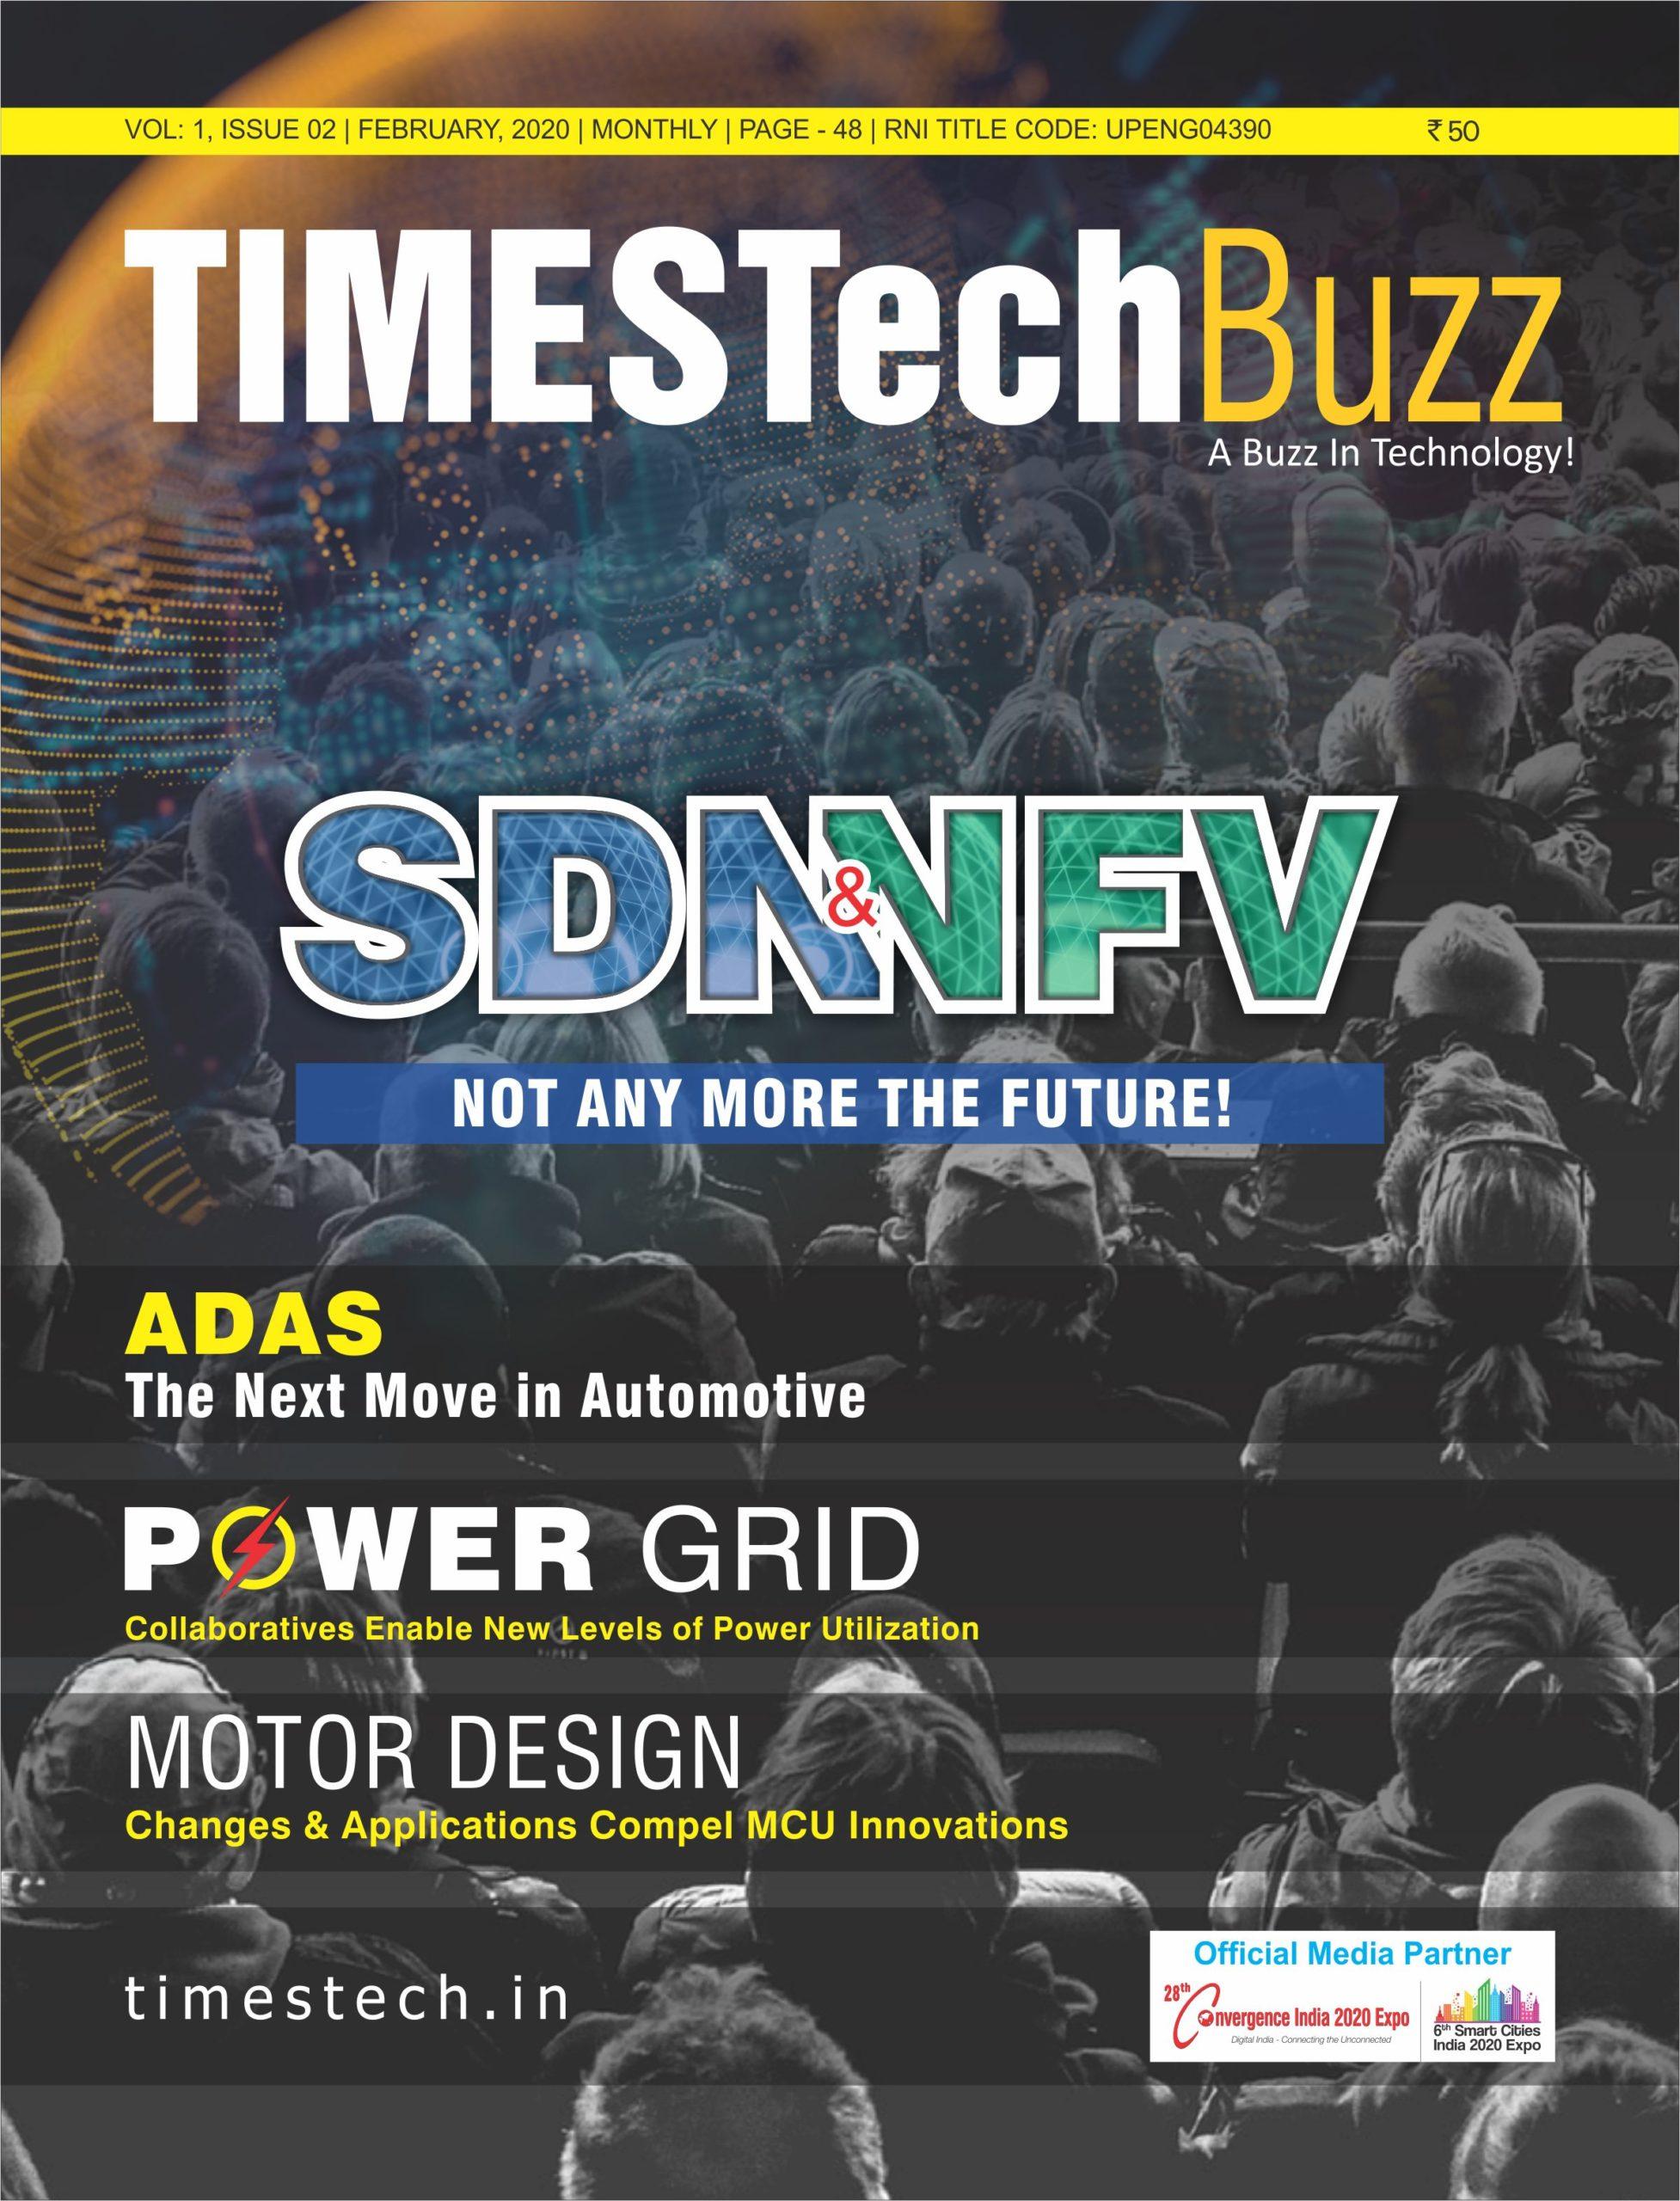 TimesTech Buzz Feb 2020